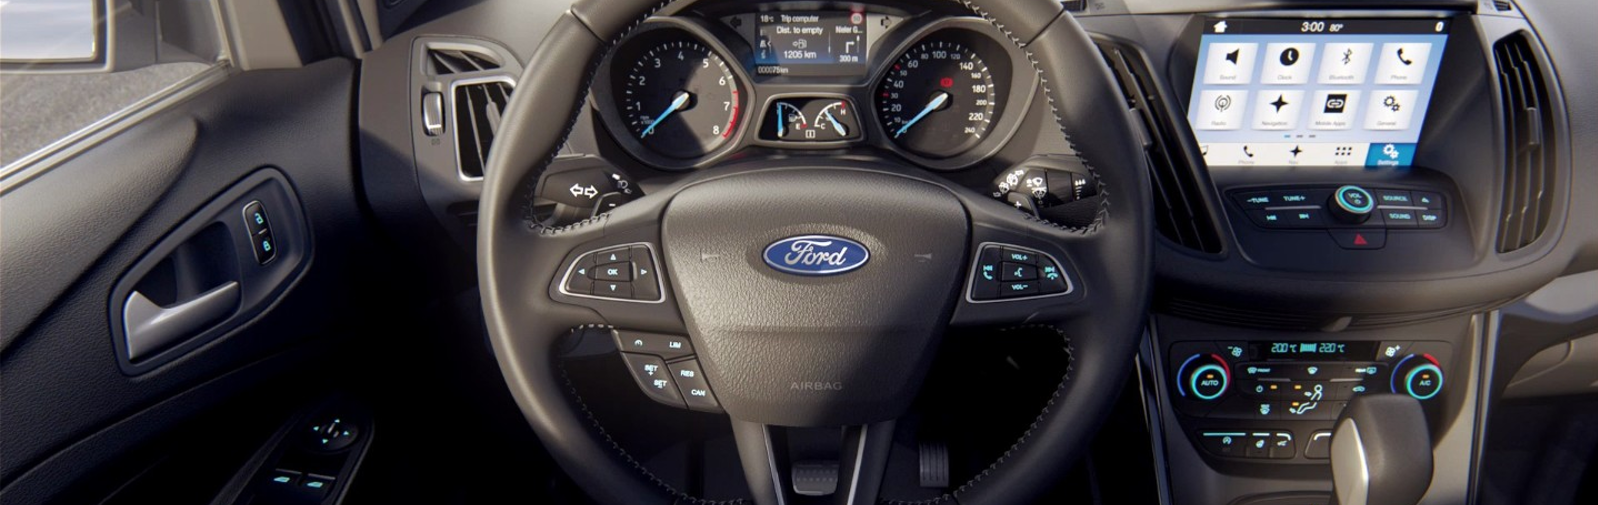 Volante Ford Kuga